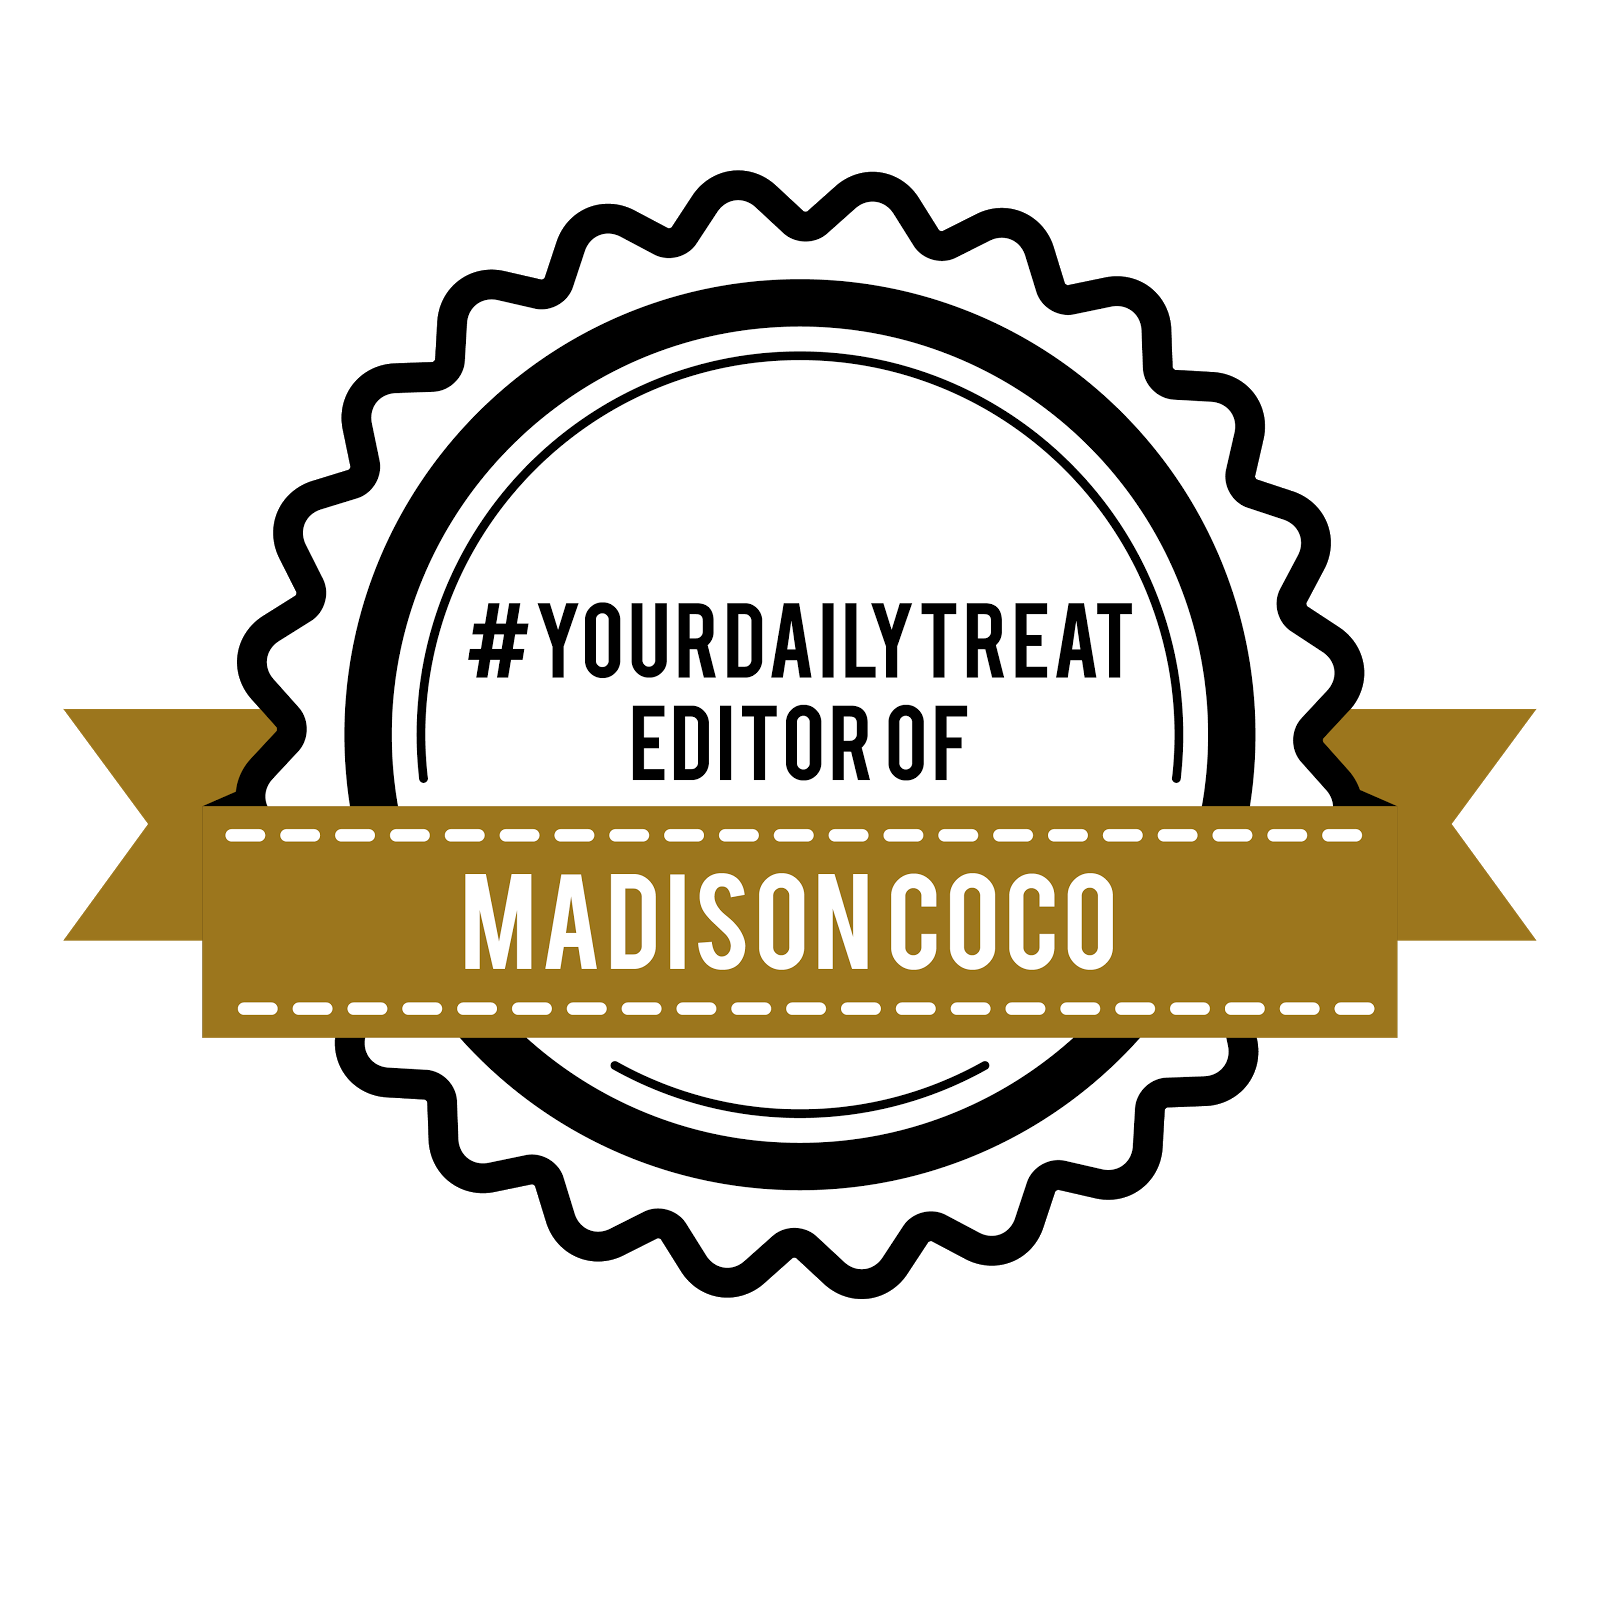 MADISON COCO